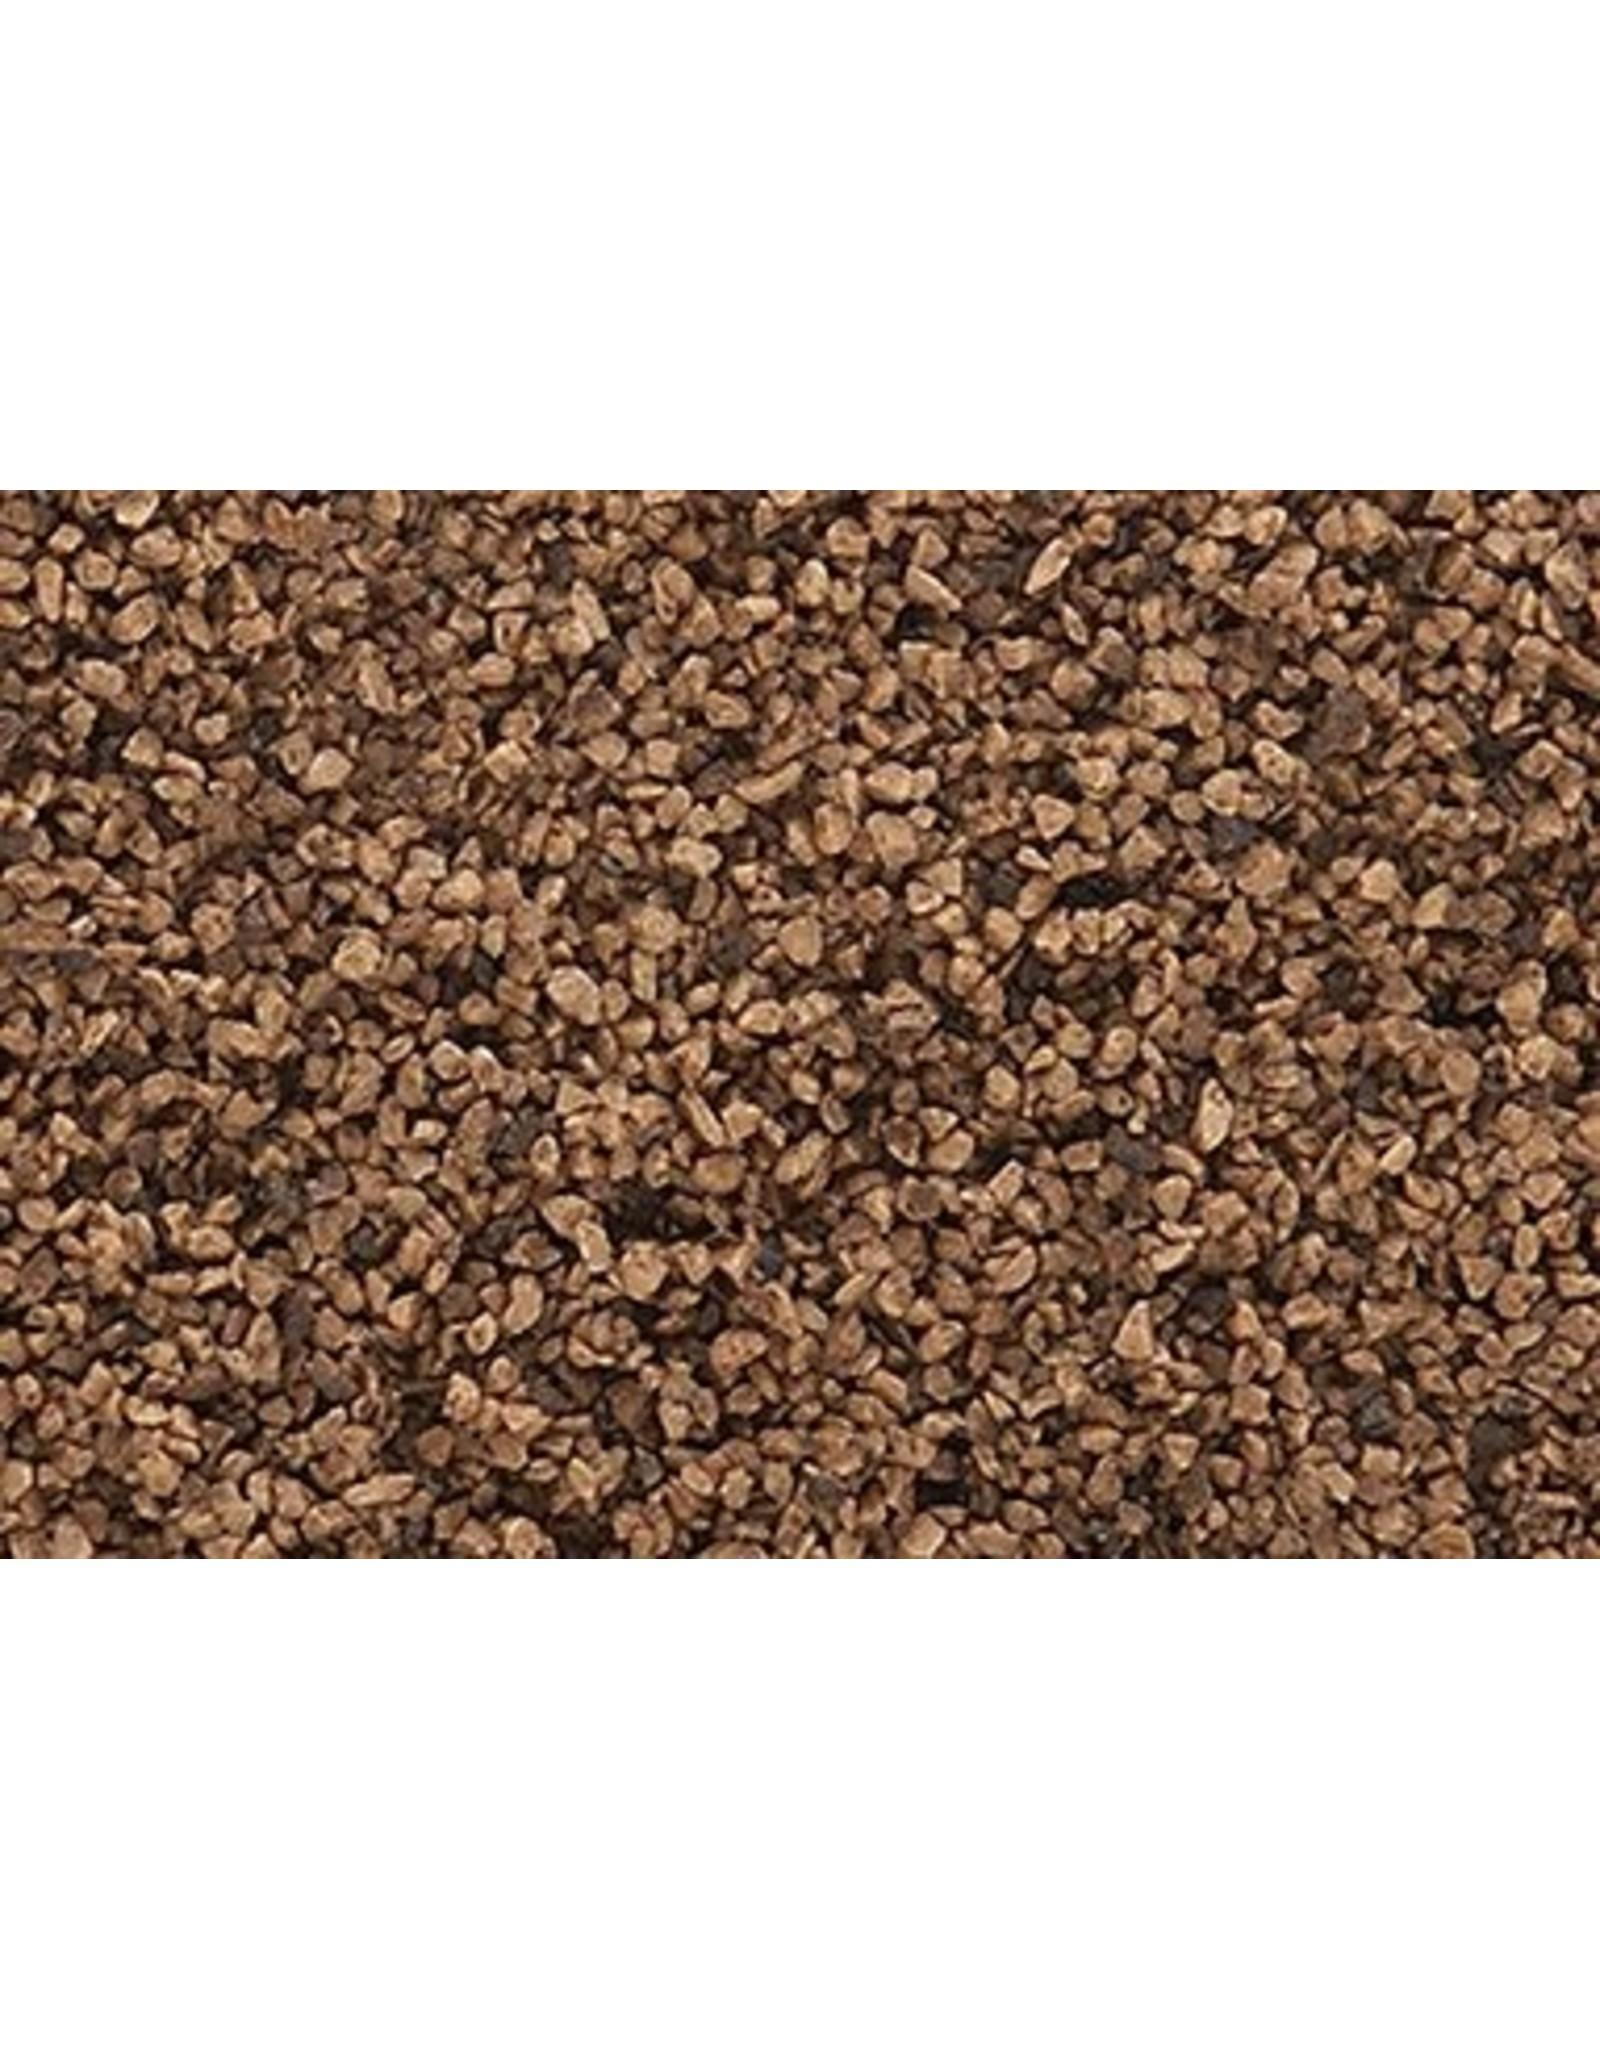 Woodland Scenics B1386 - Coarse Ballast Shaker, Brown